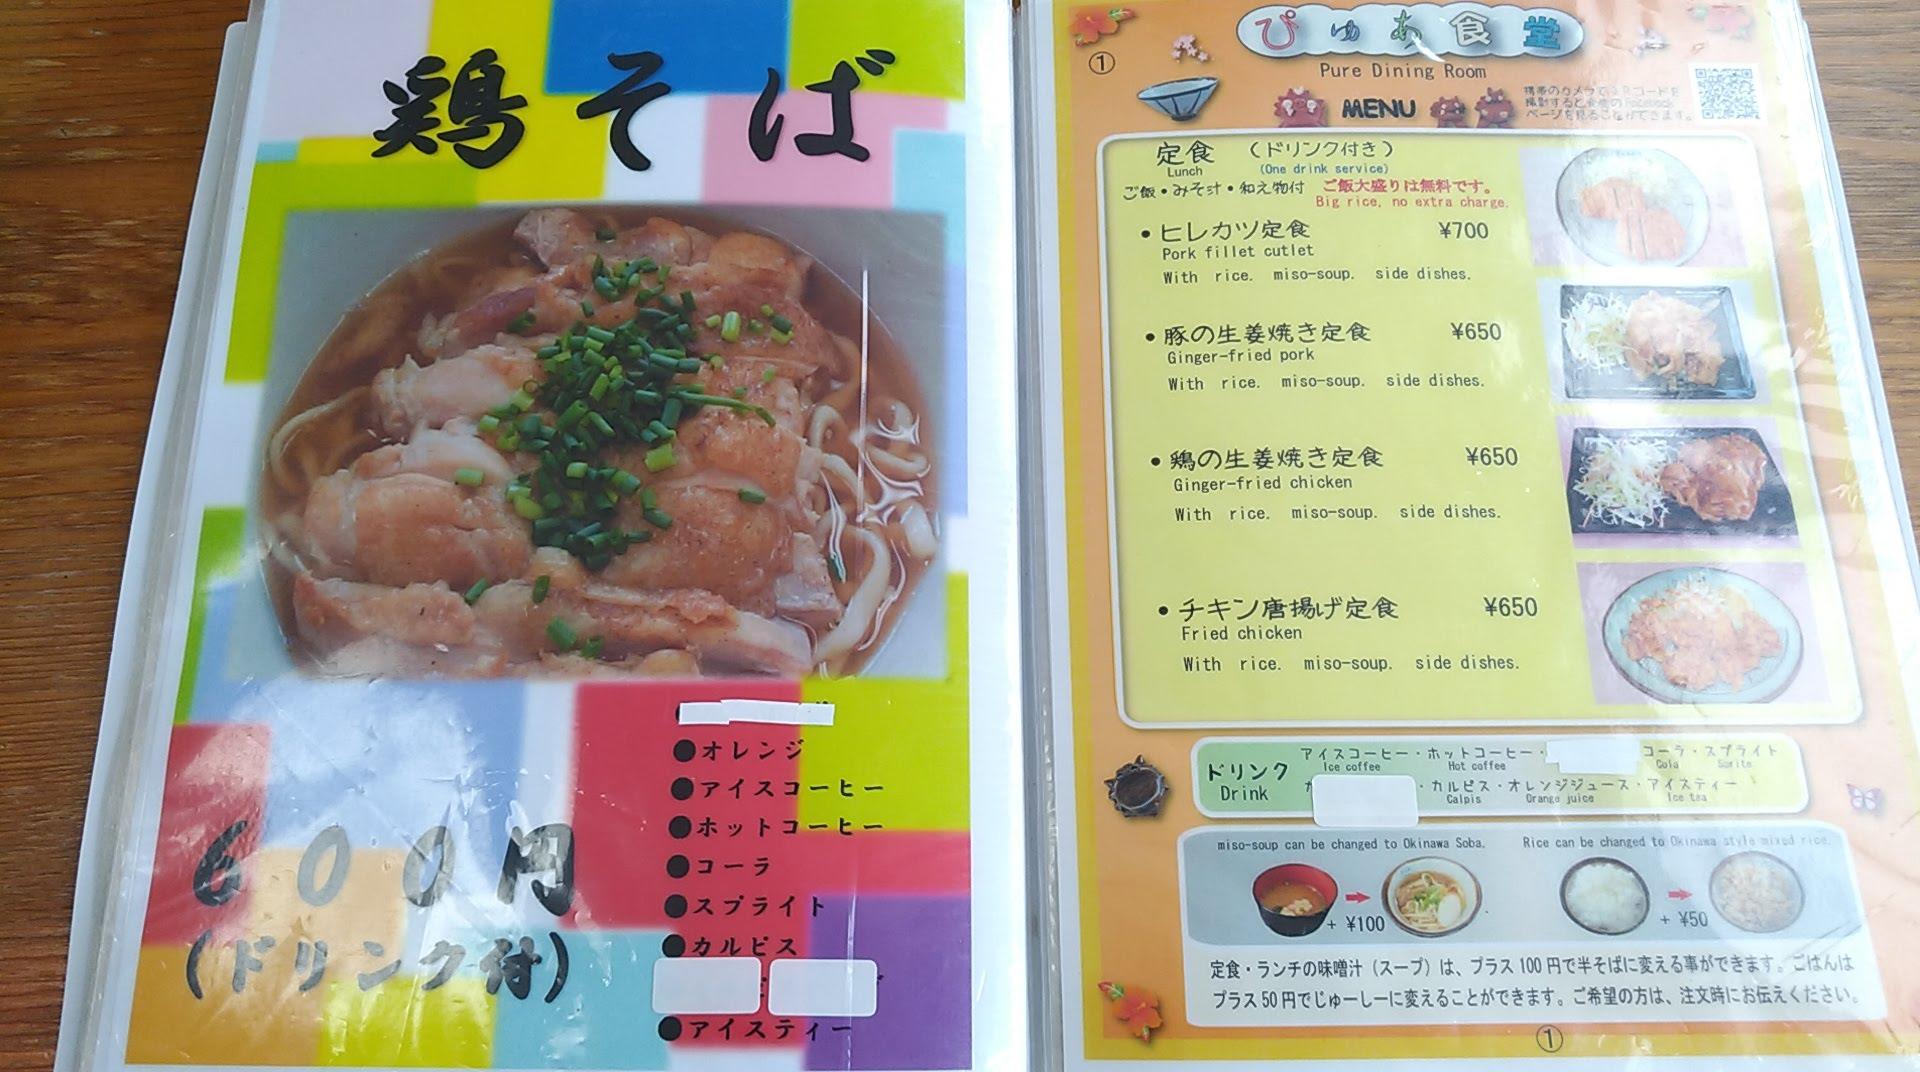 the menu of Pure shokudou 2